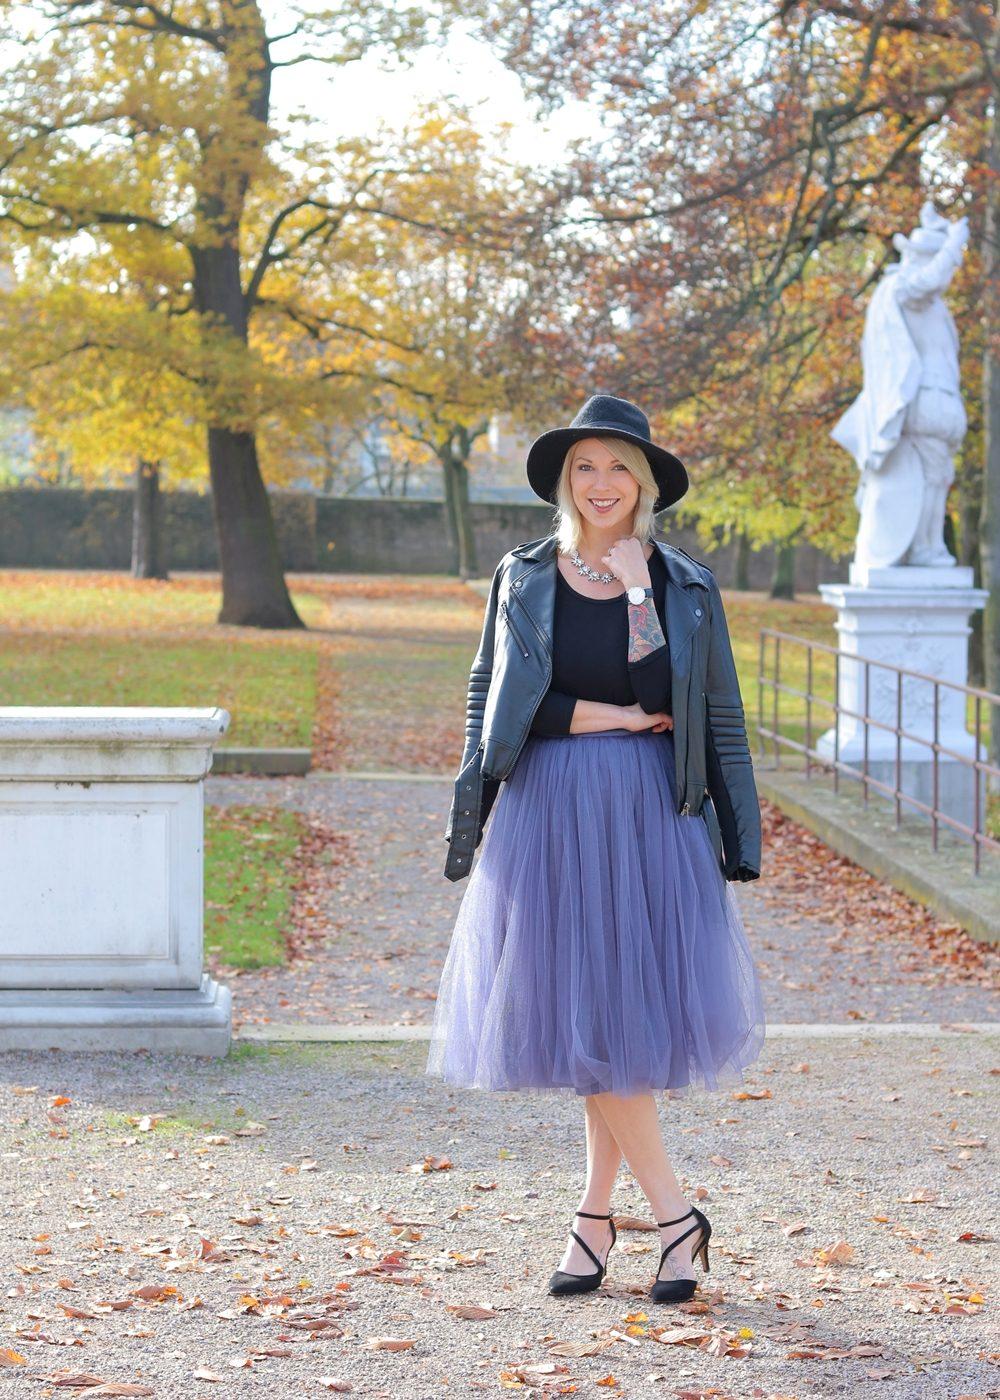 fashionblogger-karlsruhe-outfit-lila-tuellrock-asos-shirt-pumps-tamaris-schwarzer-hut-4